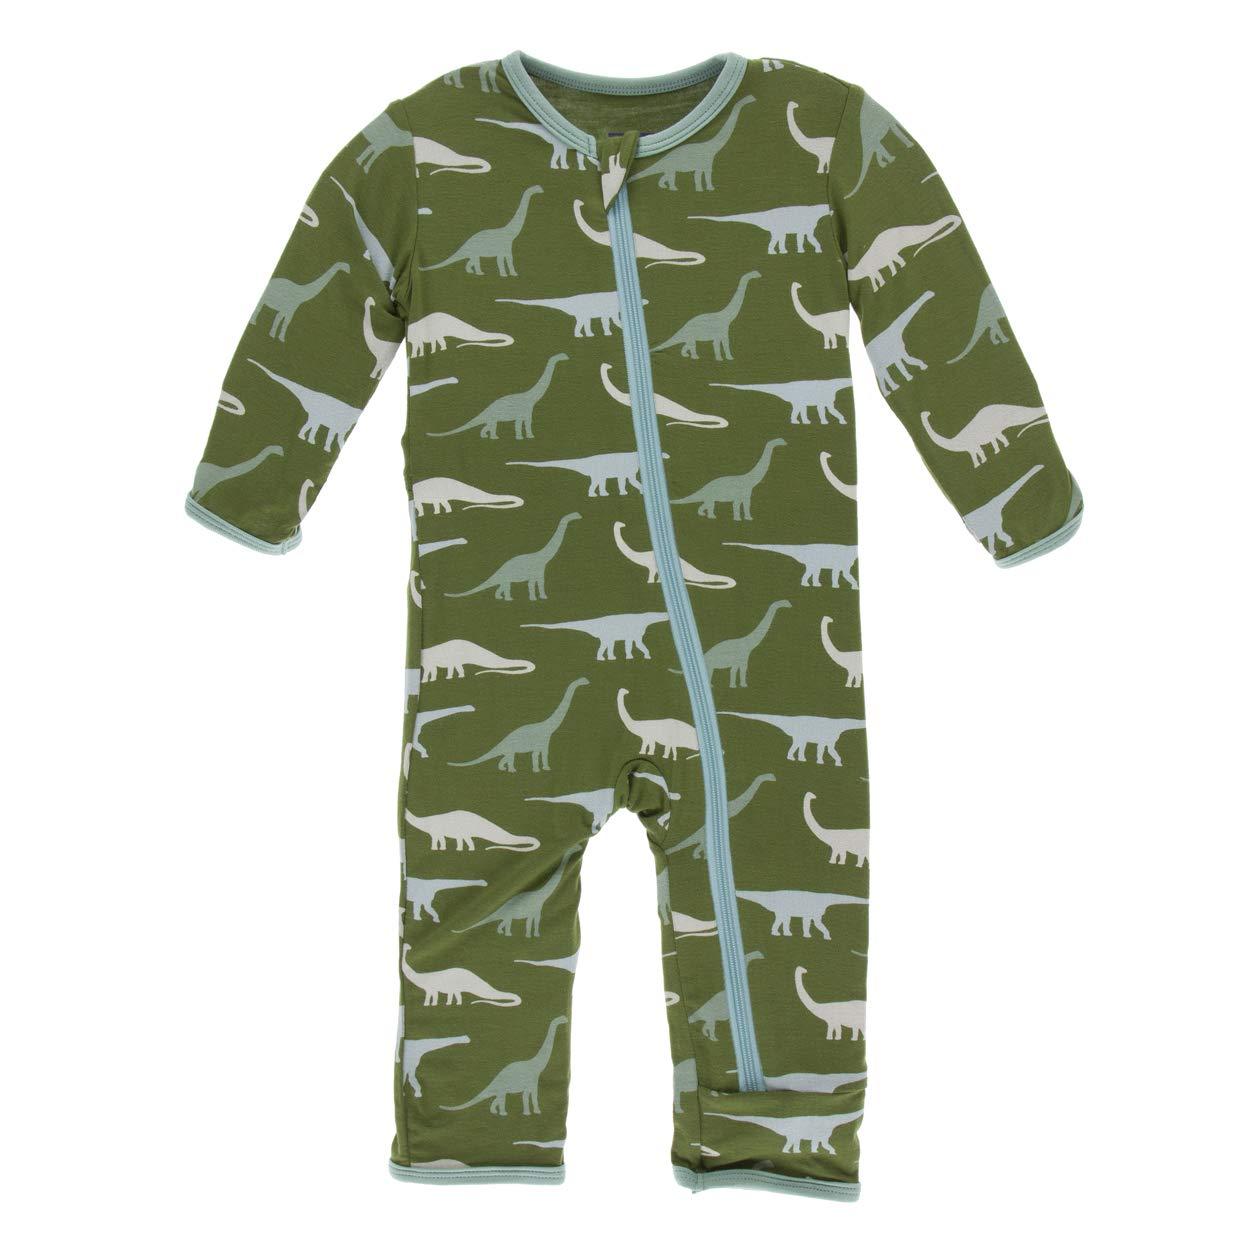 Kickee Pants Little Boys Print Coverall with Zipper - Moss Sauropods, 18-24 Months